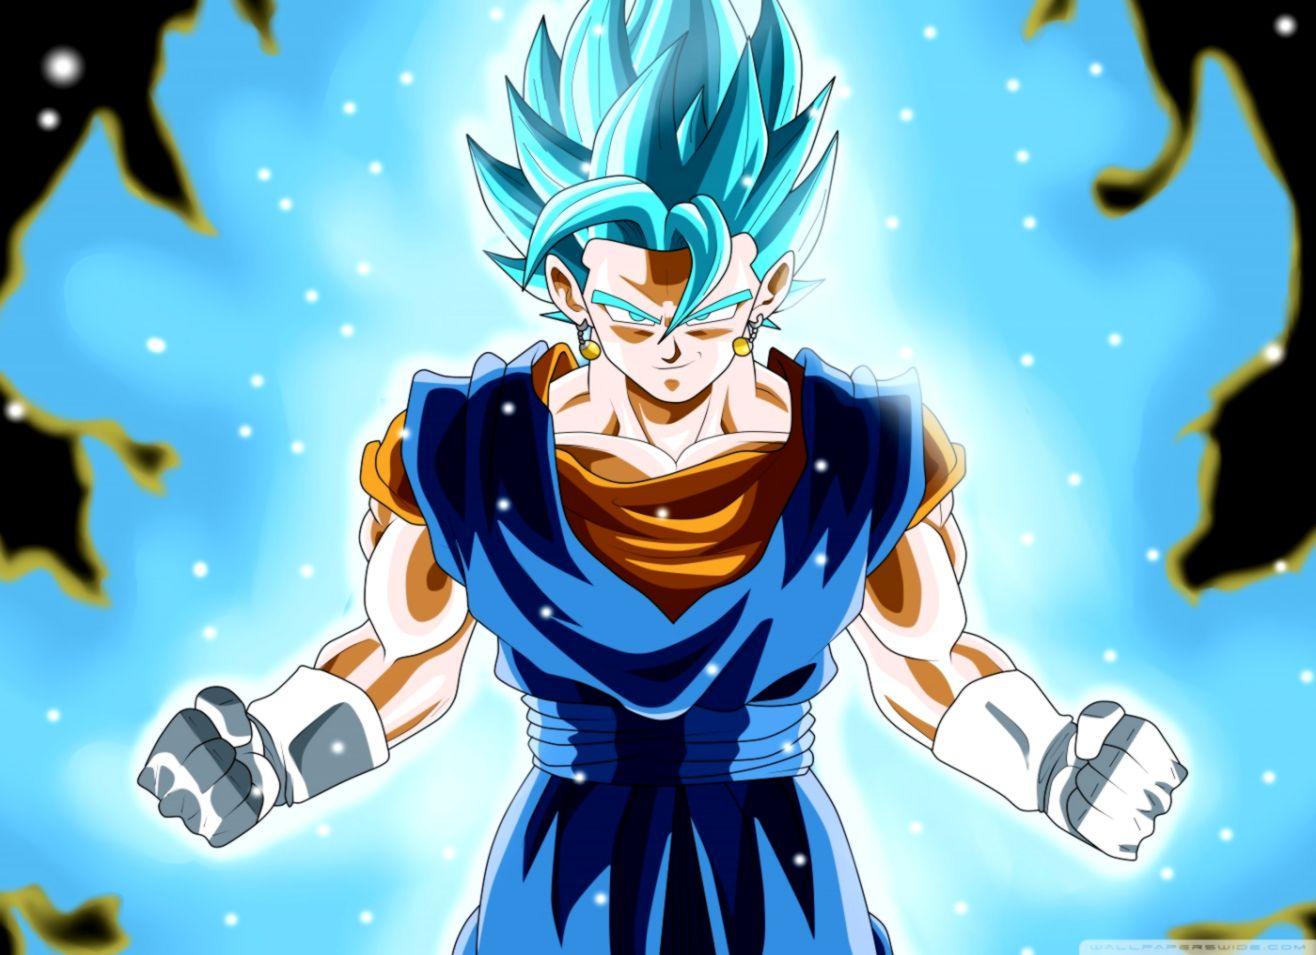 Dragon Ball Z Battle Of Gods Goku Wide Wallpaper Kingdom Wallpapers